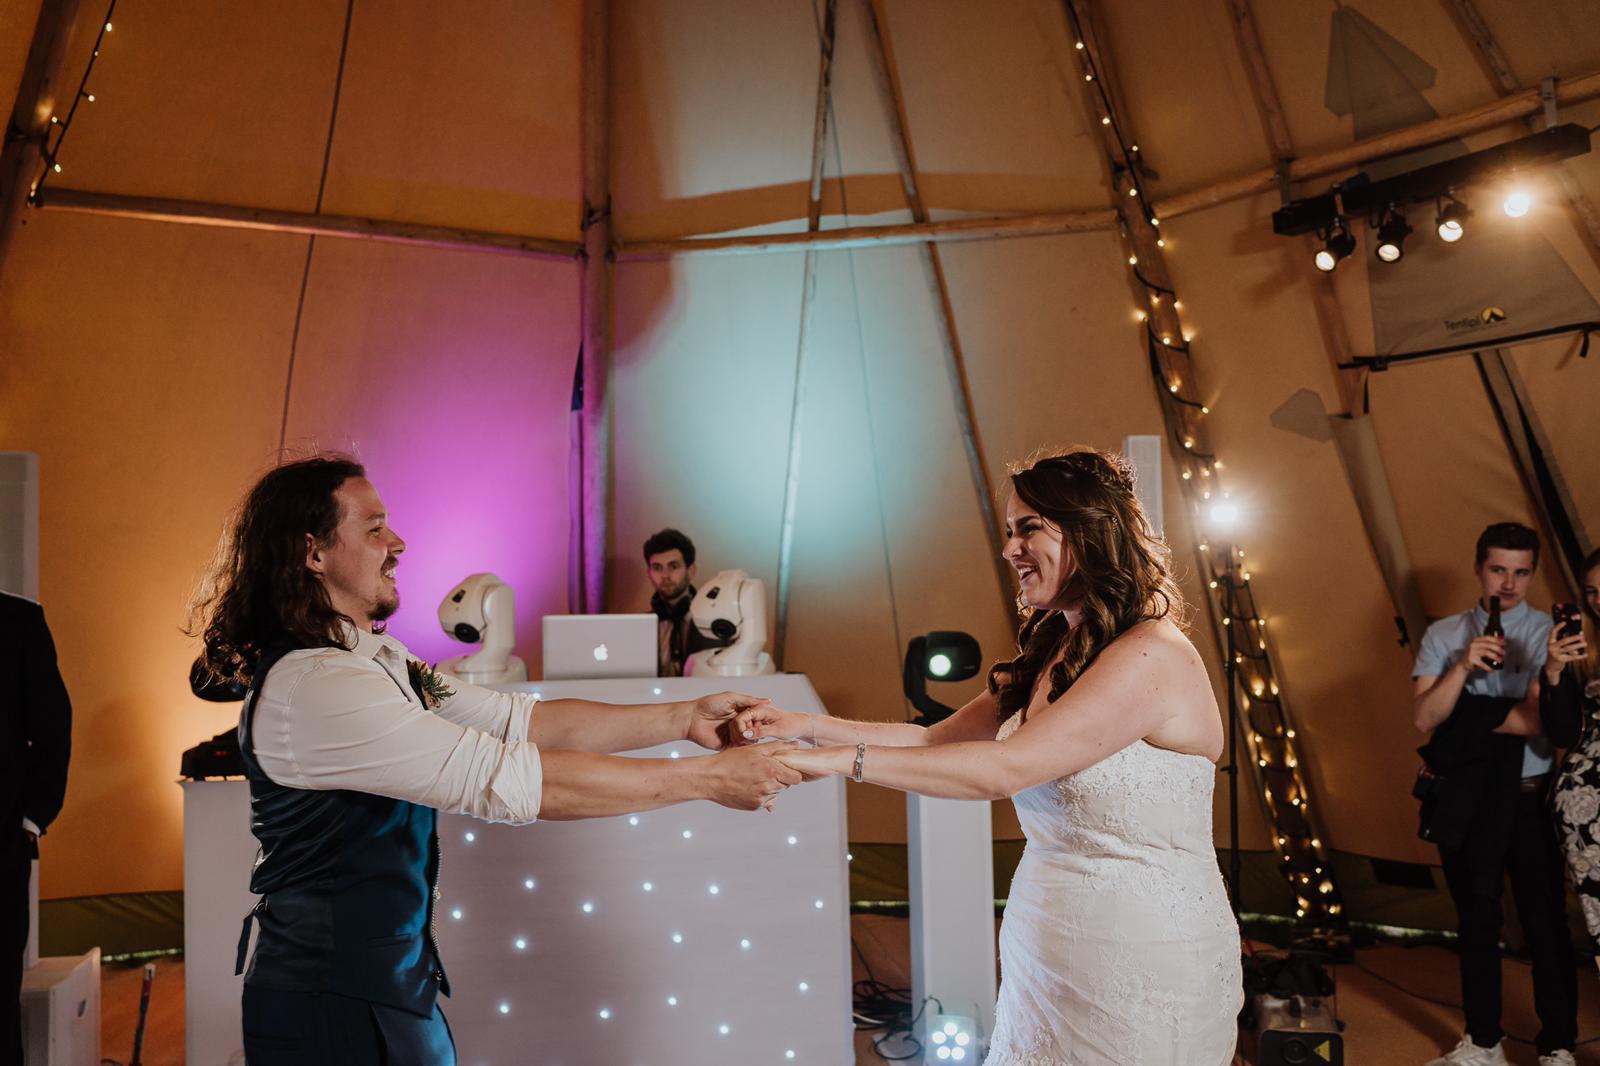 Promo Party Audio Wedding DJ Totton, Hampshire